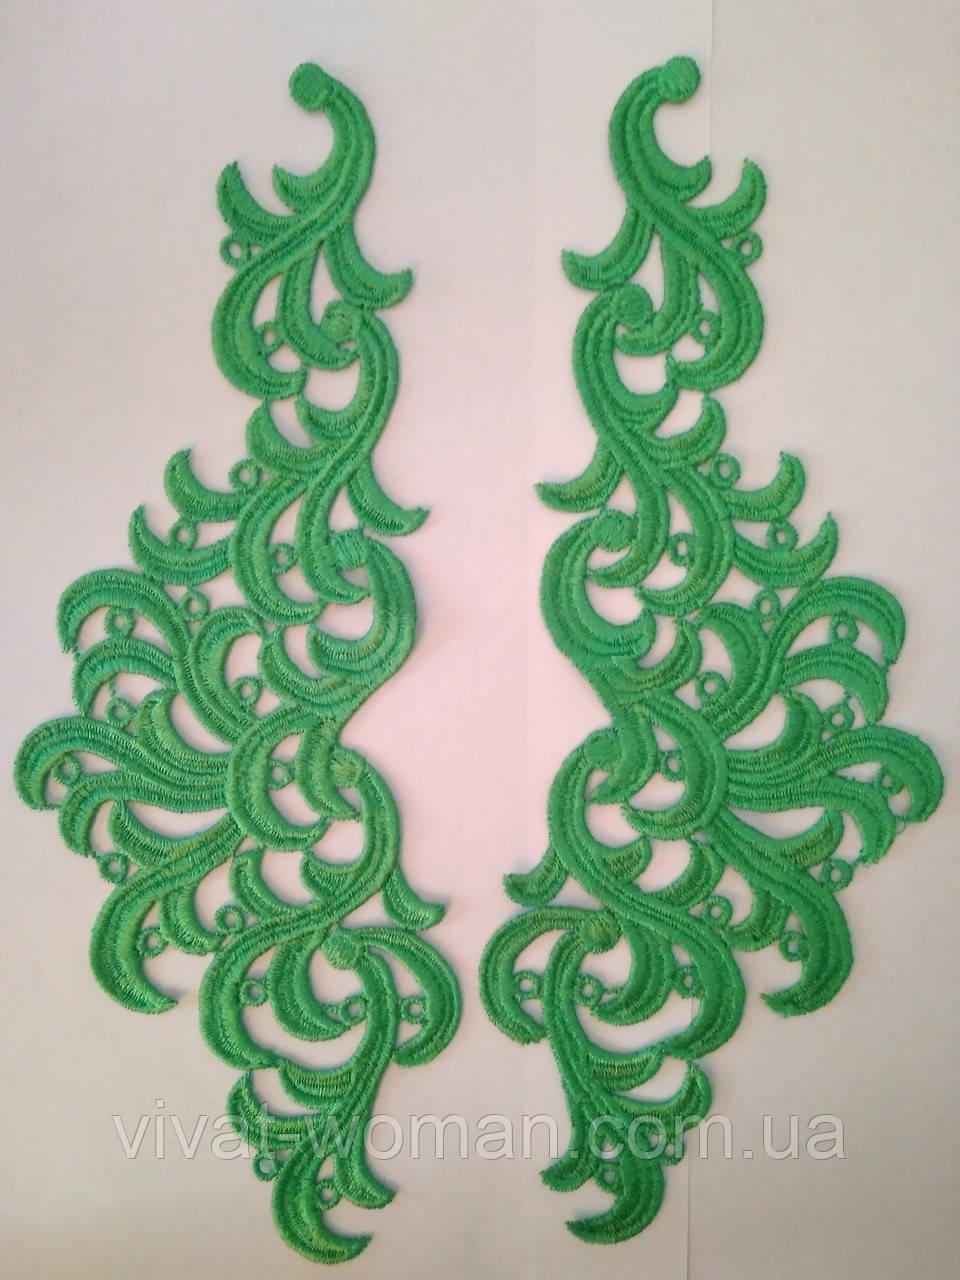 Кружевной фрагмент (лейс) Лаура зеленый, 9*26 см. Цена за пару